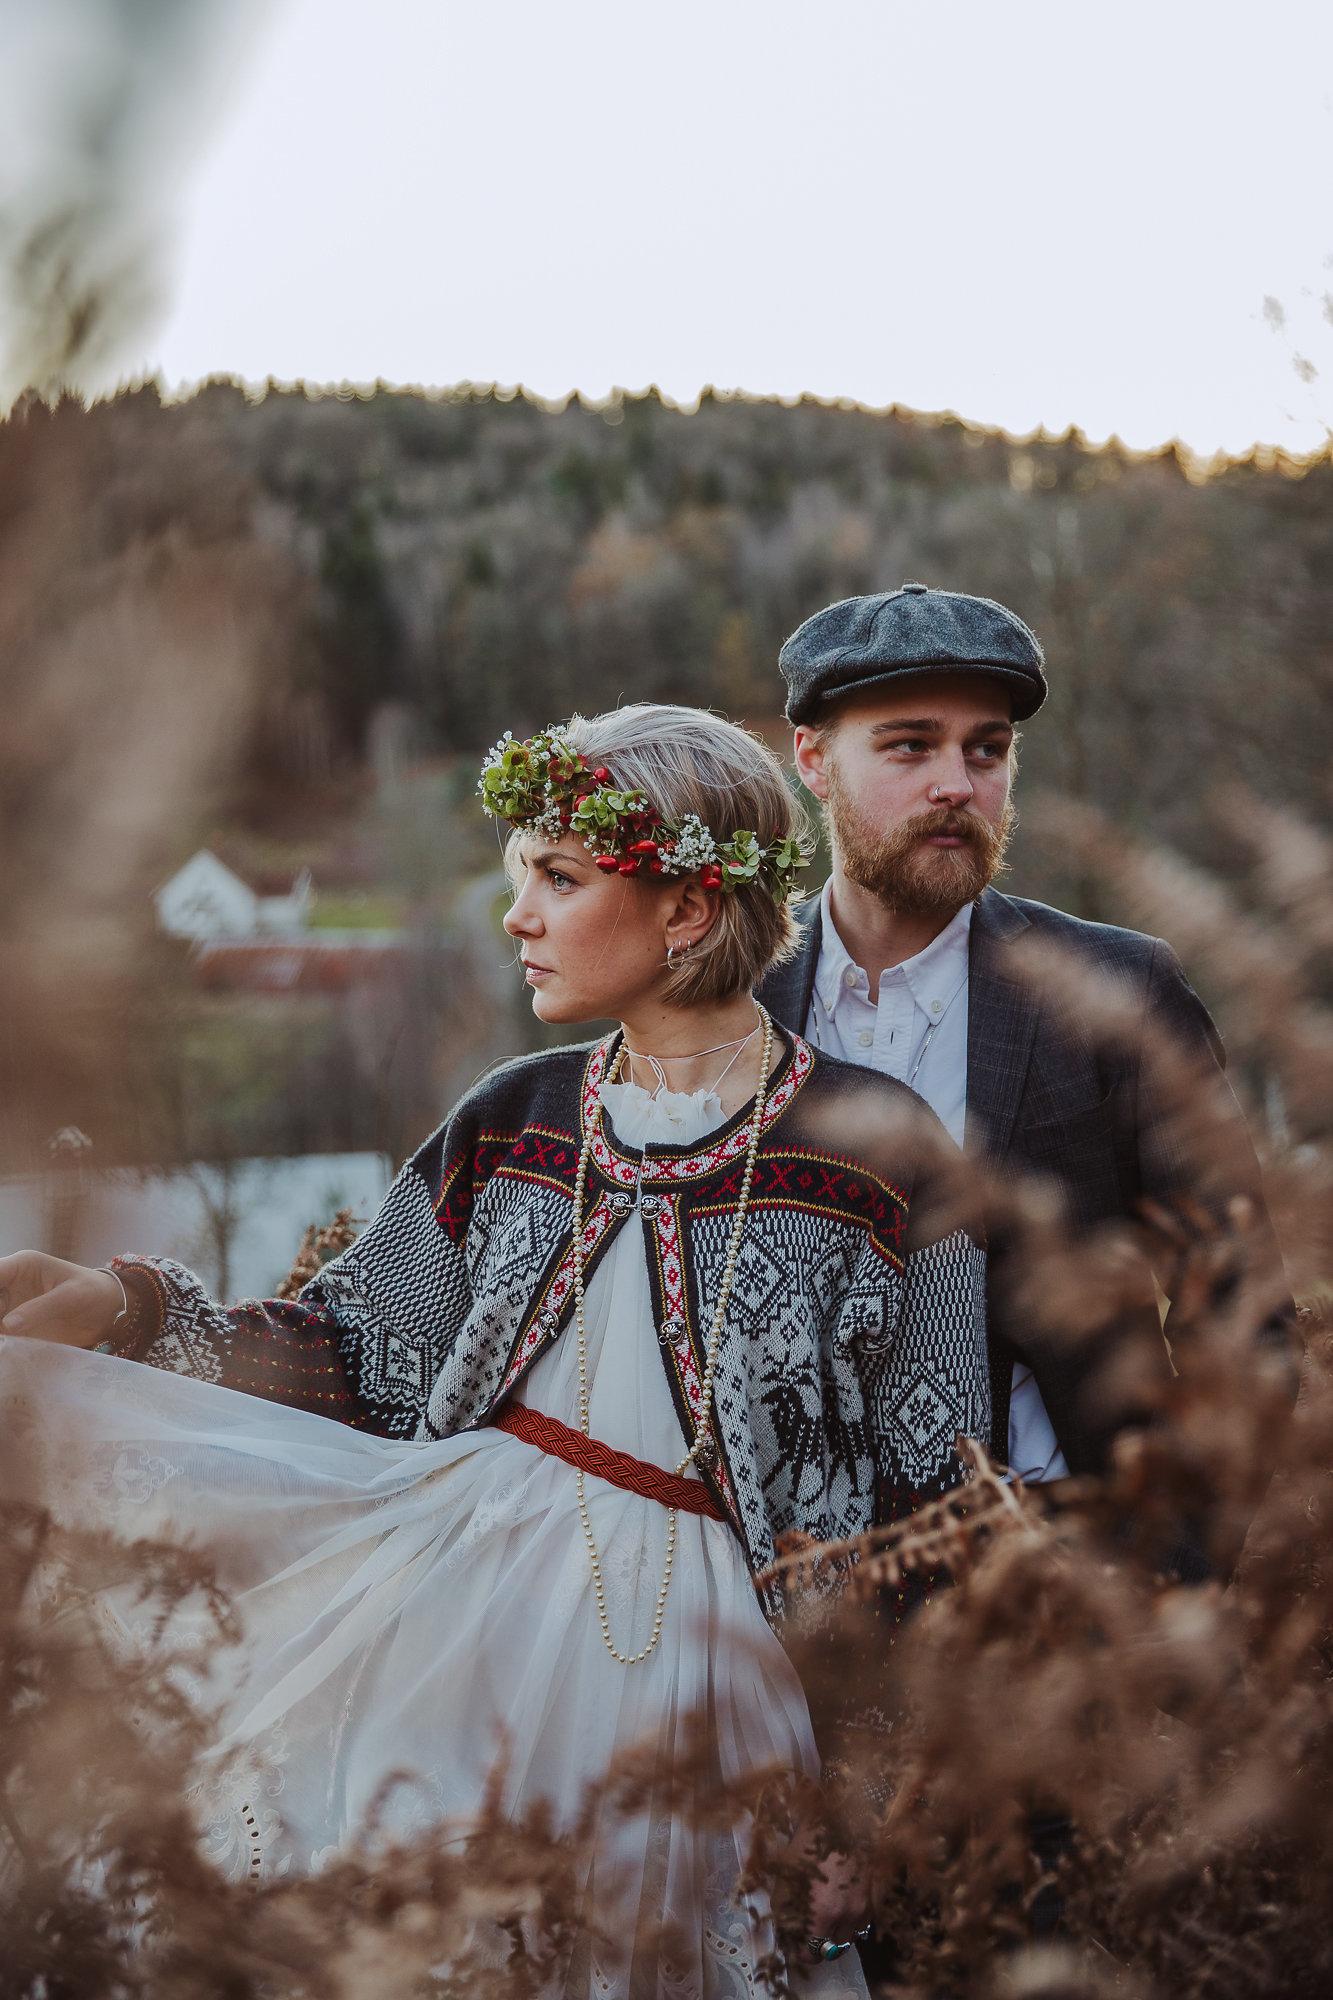 MajAxel_2017_Sweden_Weddingphotographer_NatalieGreppi_WEB-103.jpg